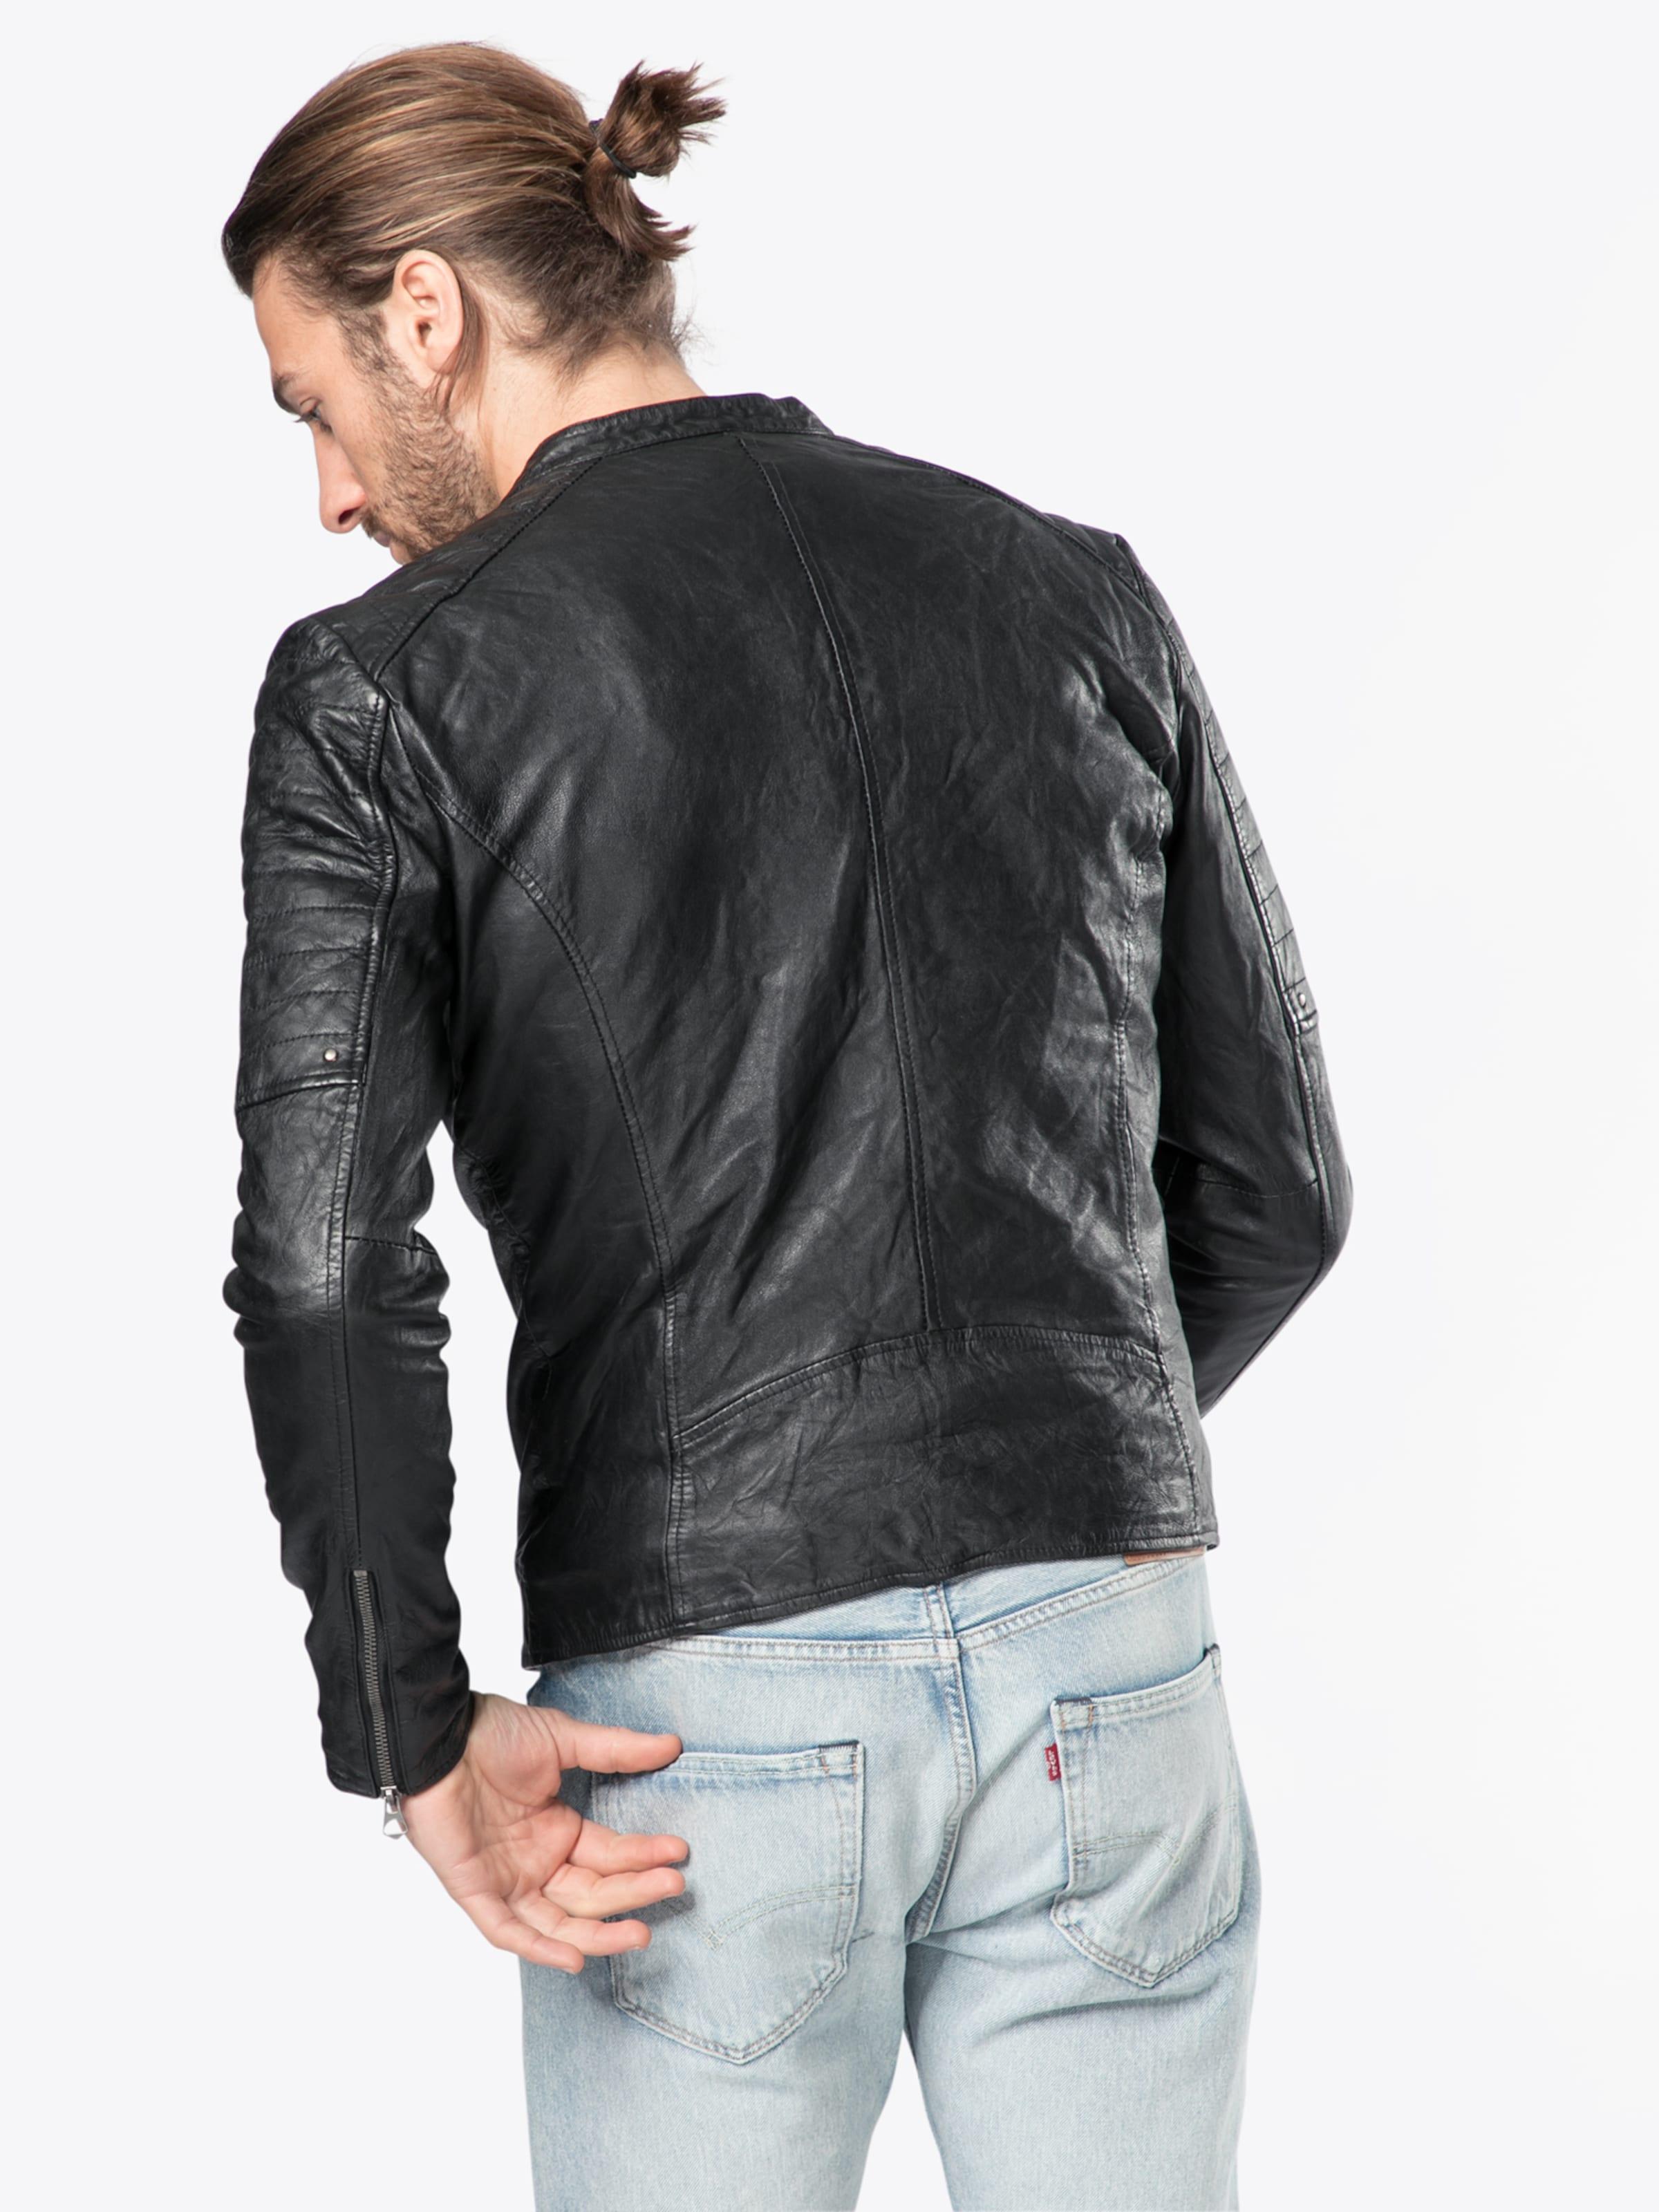 Veste Noos' Noir Lamb Leather saison Jacket Jones Jackamp; Mi 'jjvrichard En vmOn80wNPy